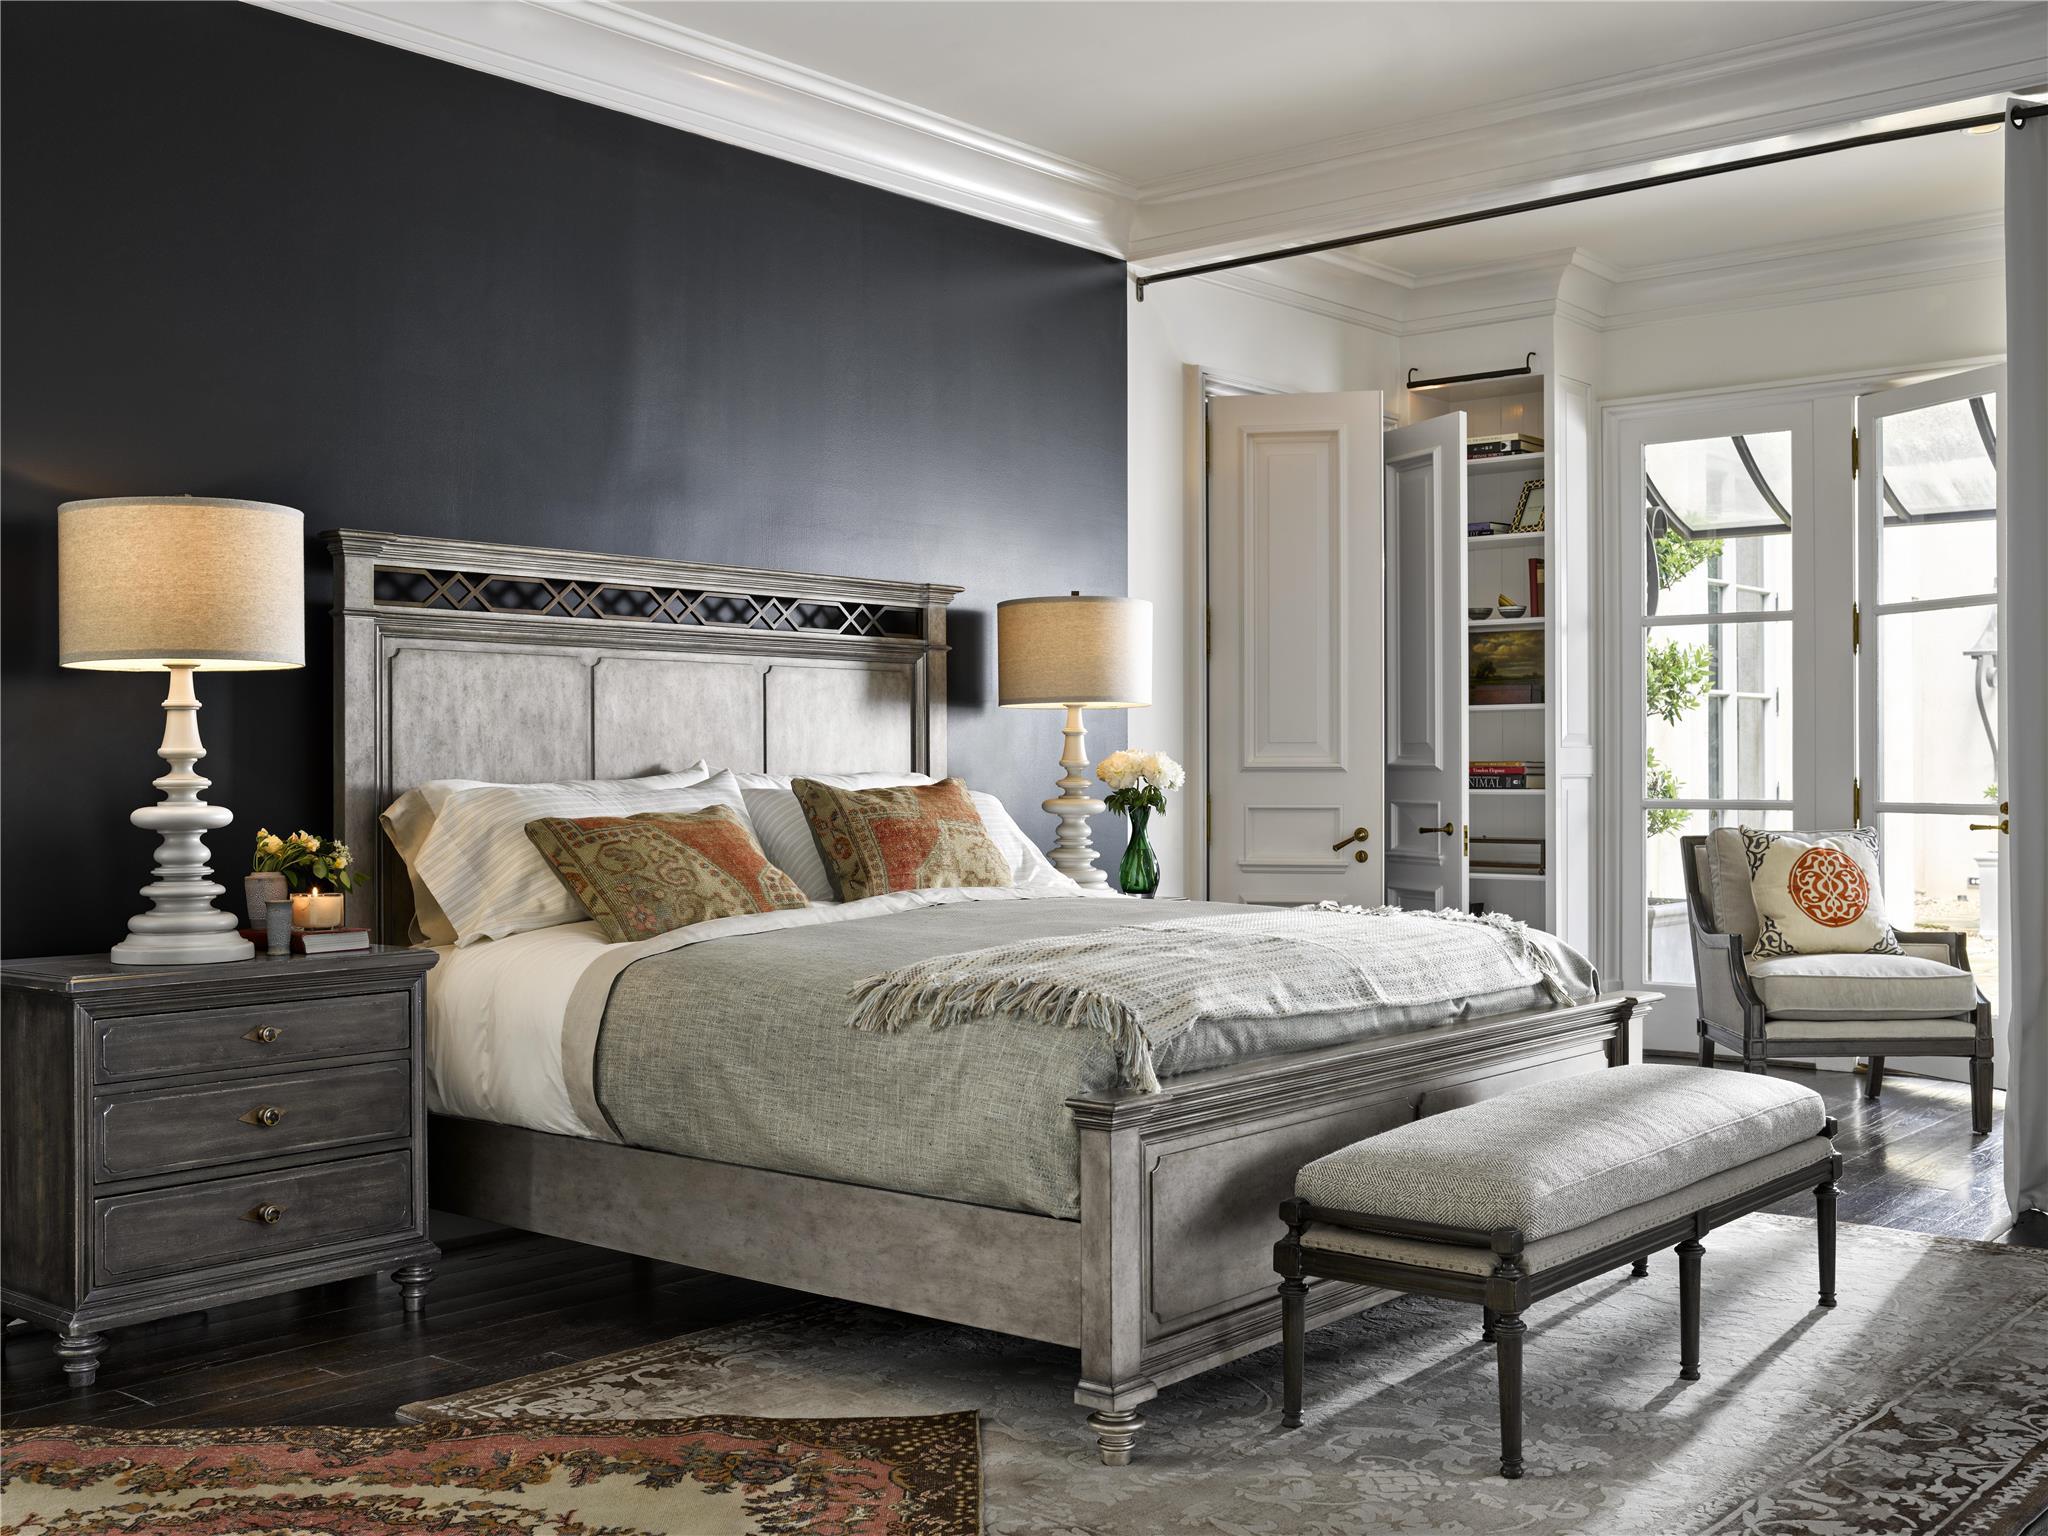 Universal Furniture  Postscript  Cable Knit Bed Set King 66